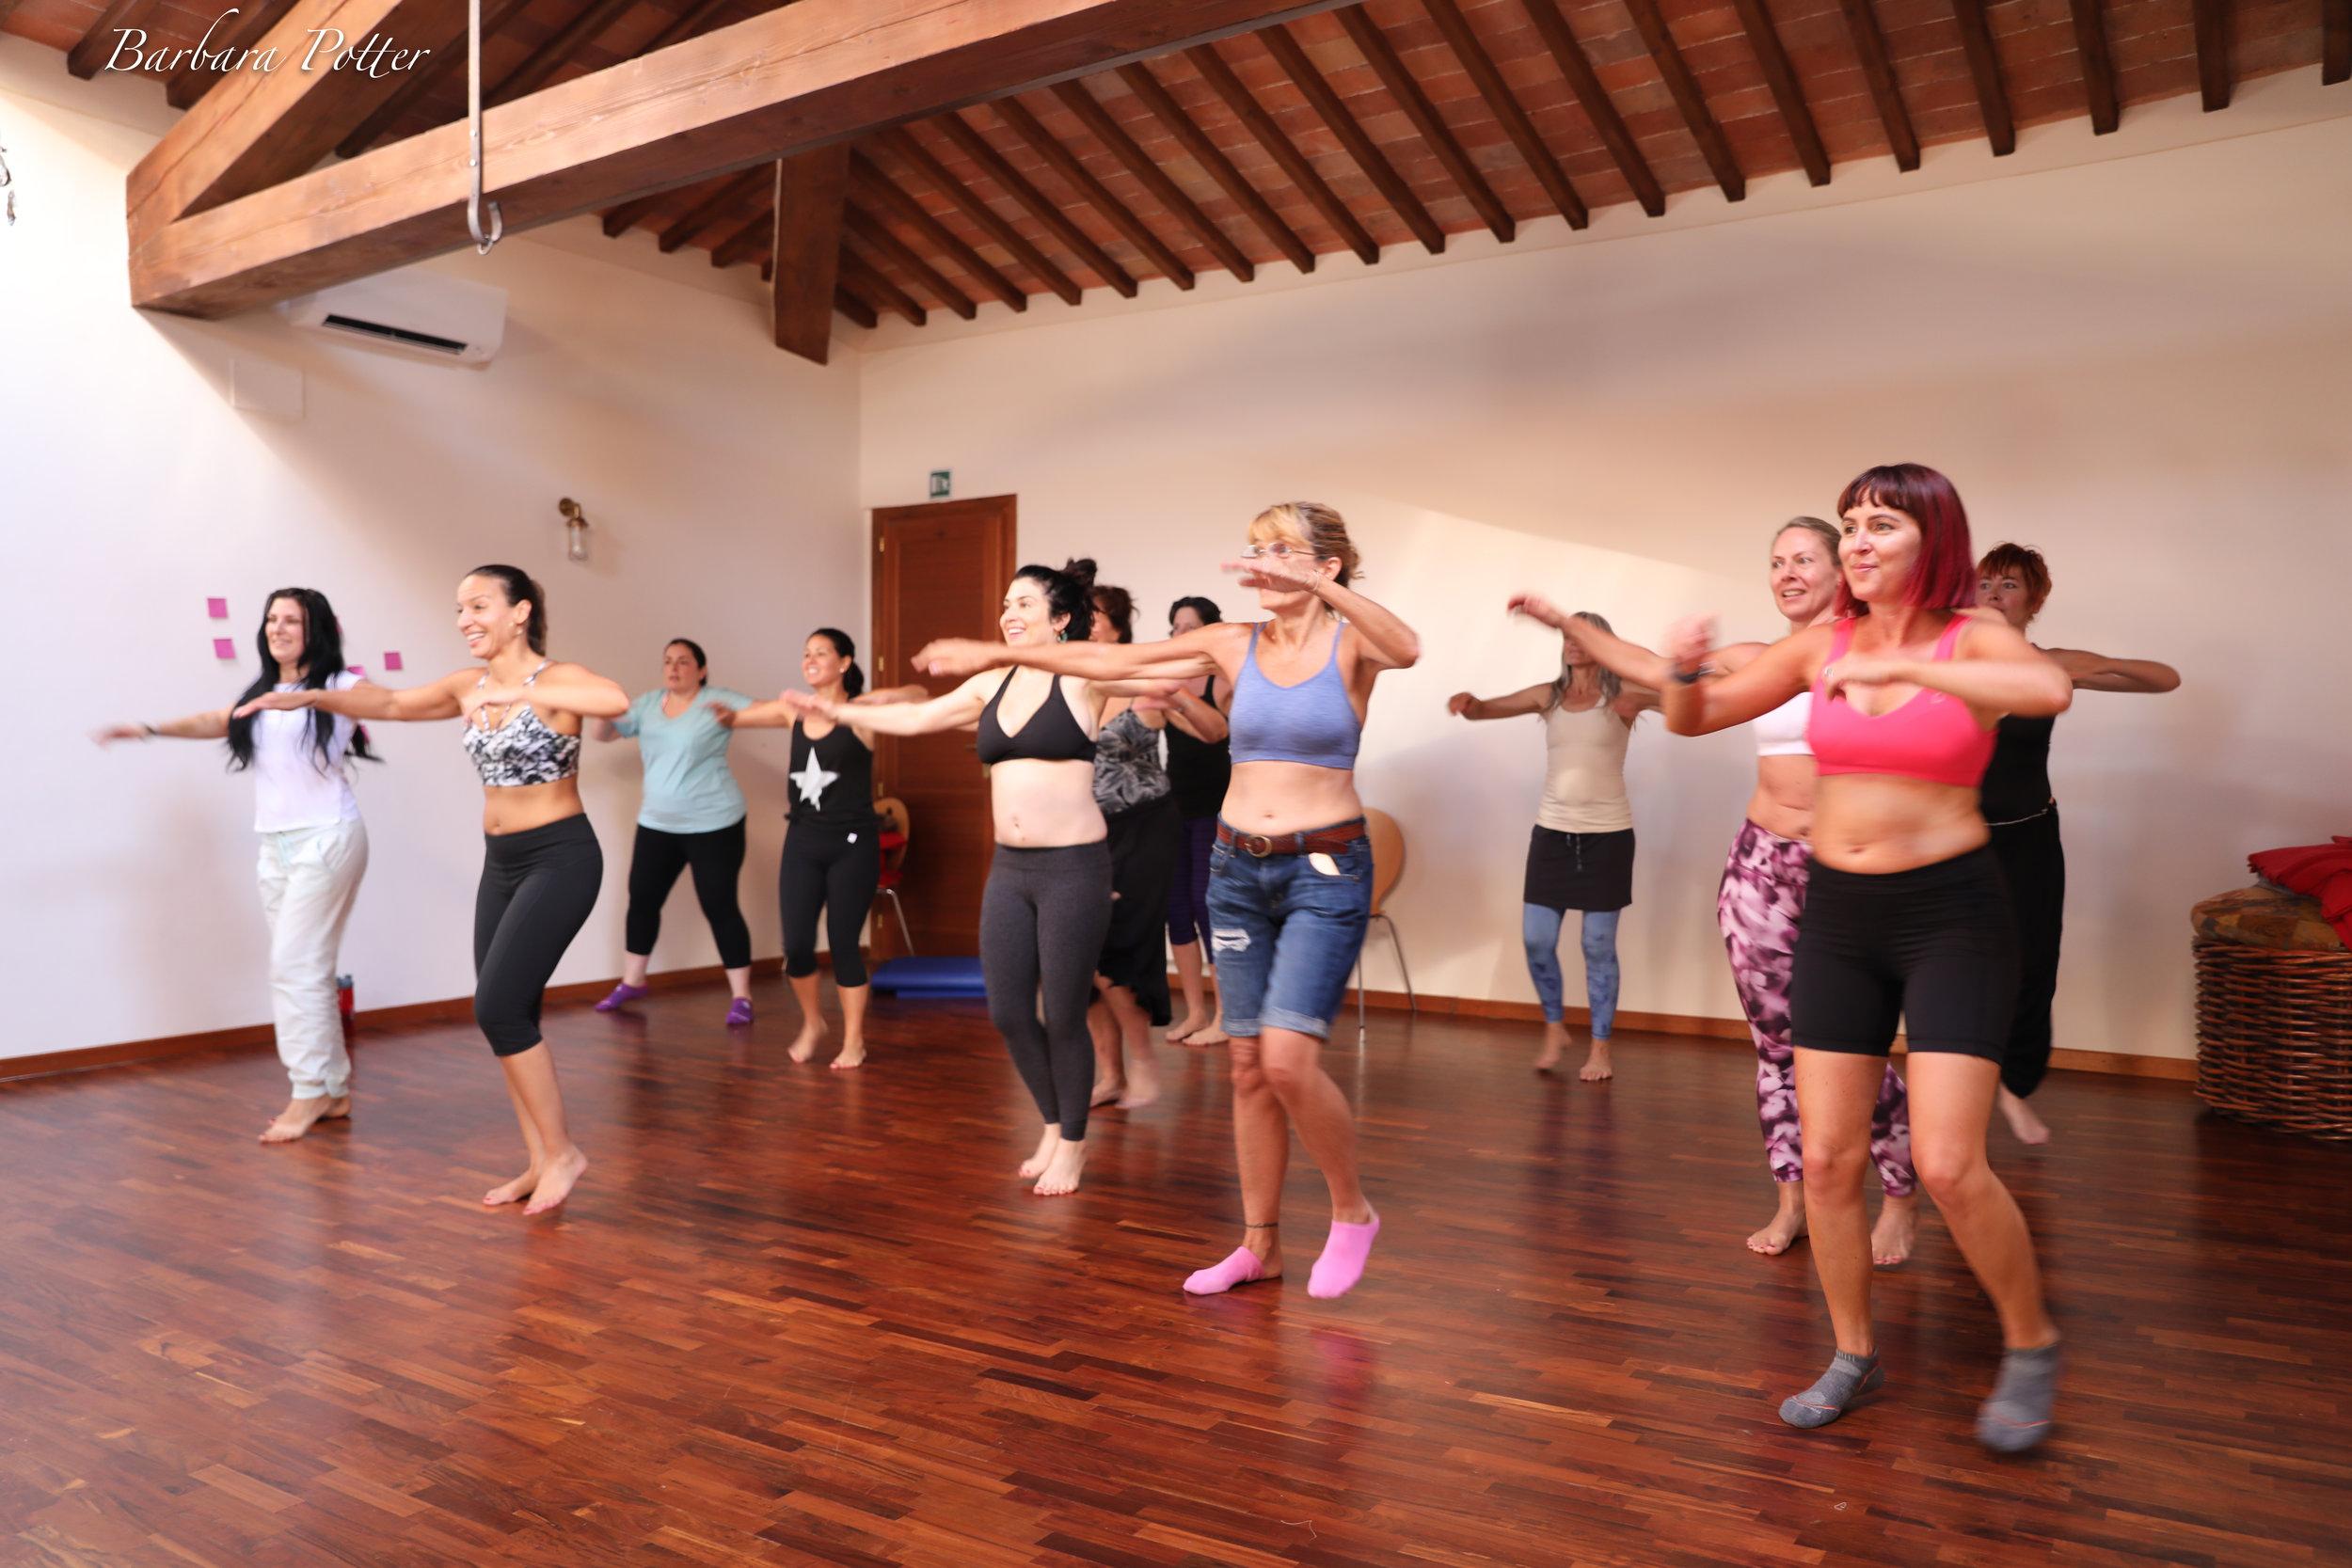 dance 5 Tuscany (1 of 1).jpg